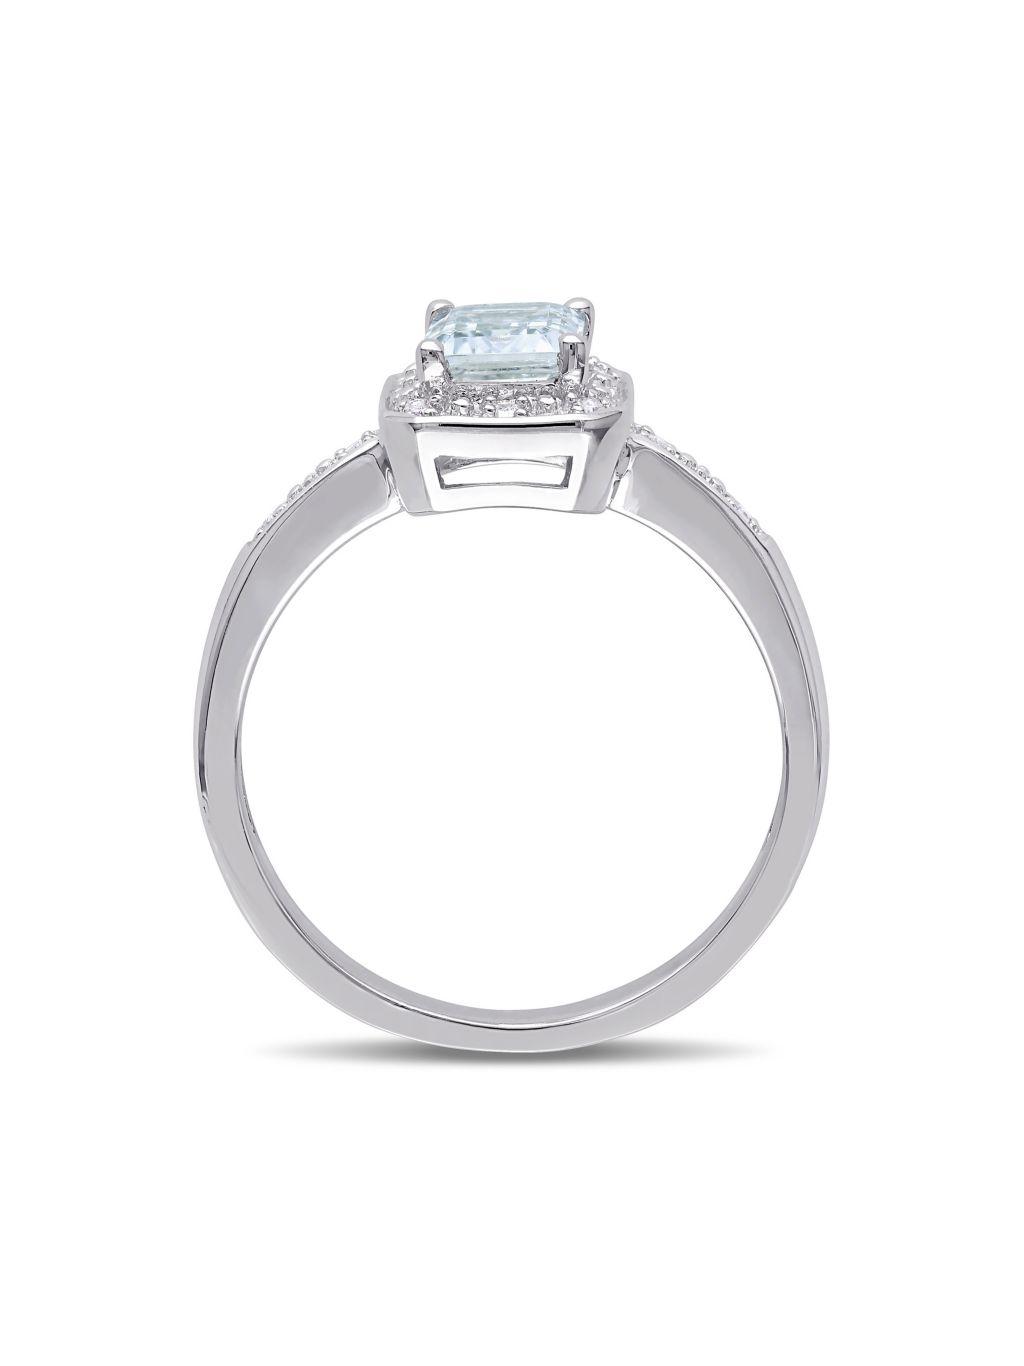 Sonatina Sterling Silver, Aquamarine & Diamond Solitaire Ring